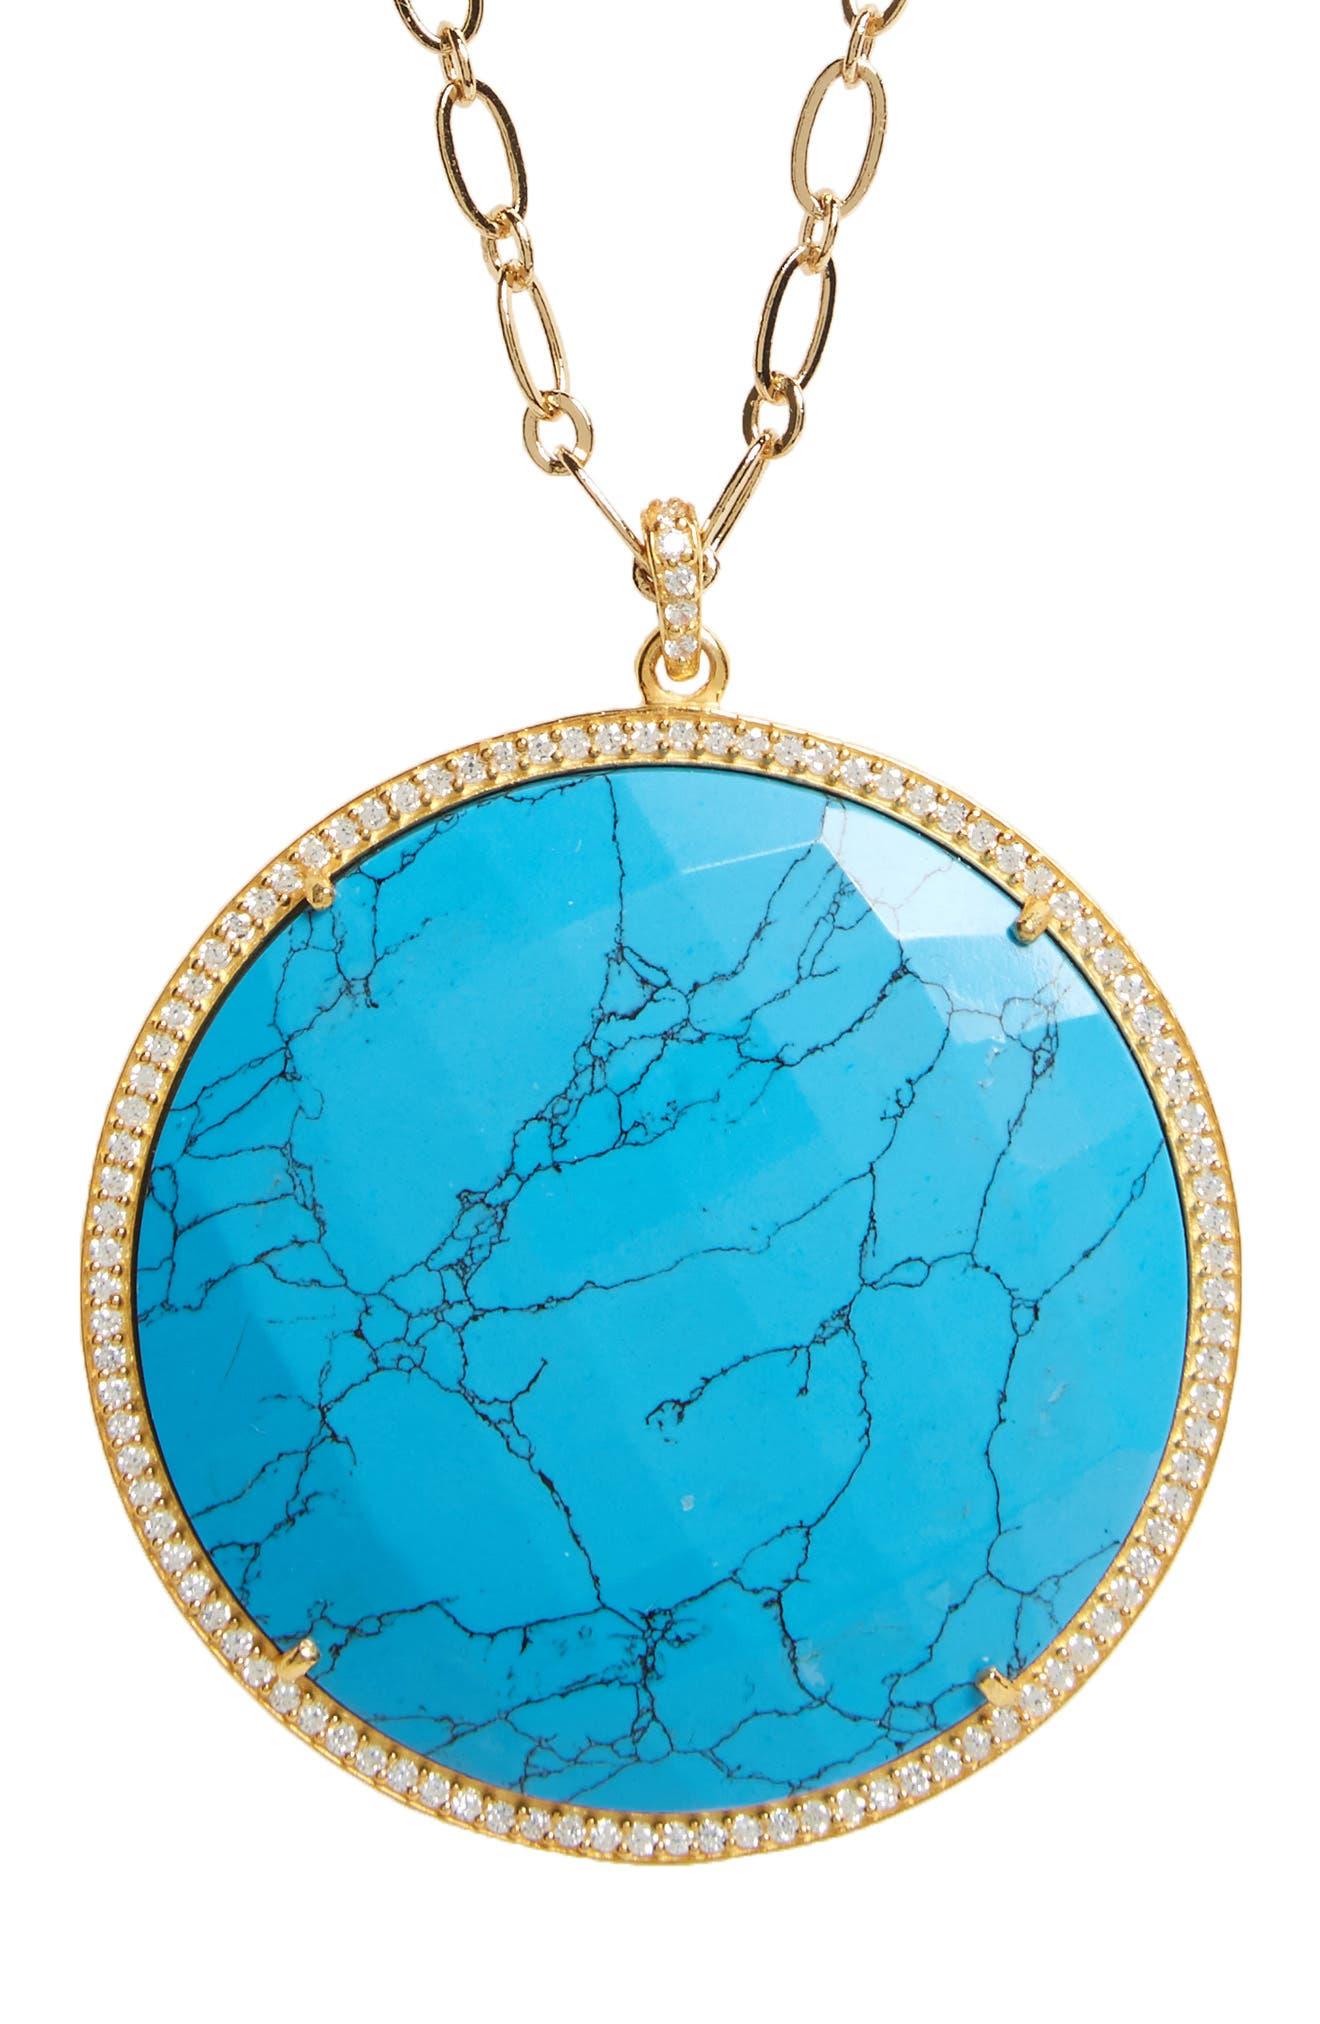 Alternate Image 1 Selected - Susan Hanover Large Semiprecious Stone Pendant Necklace